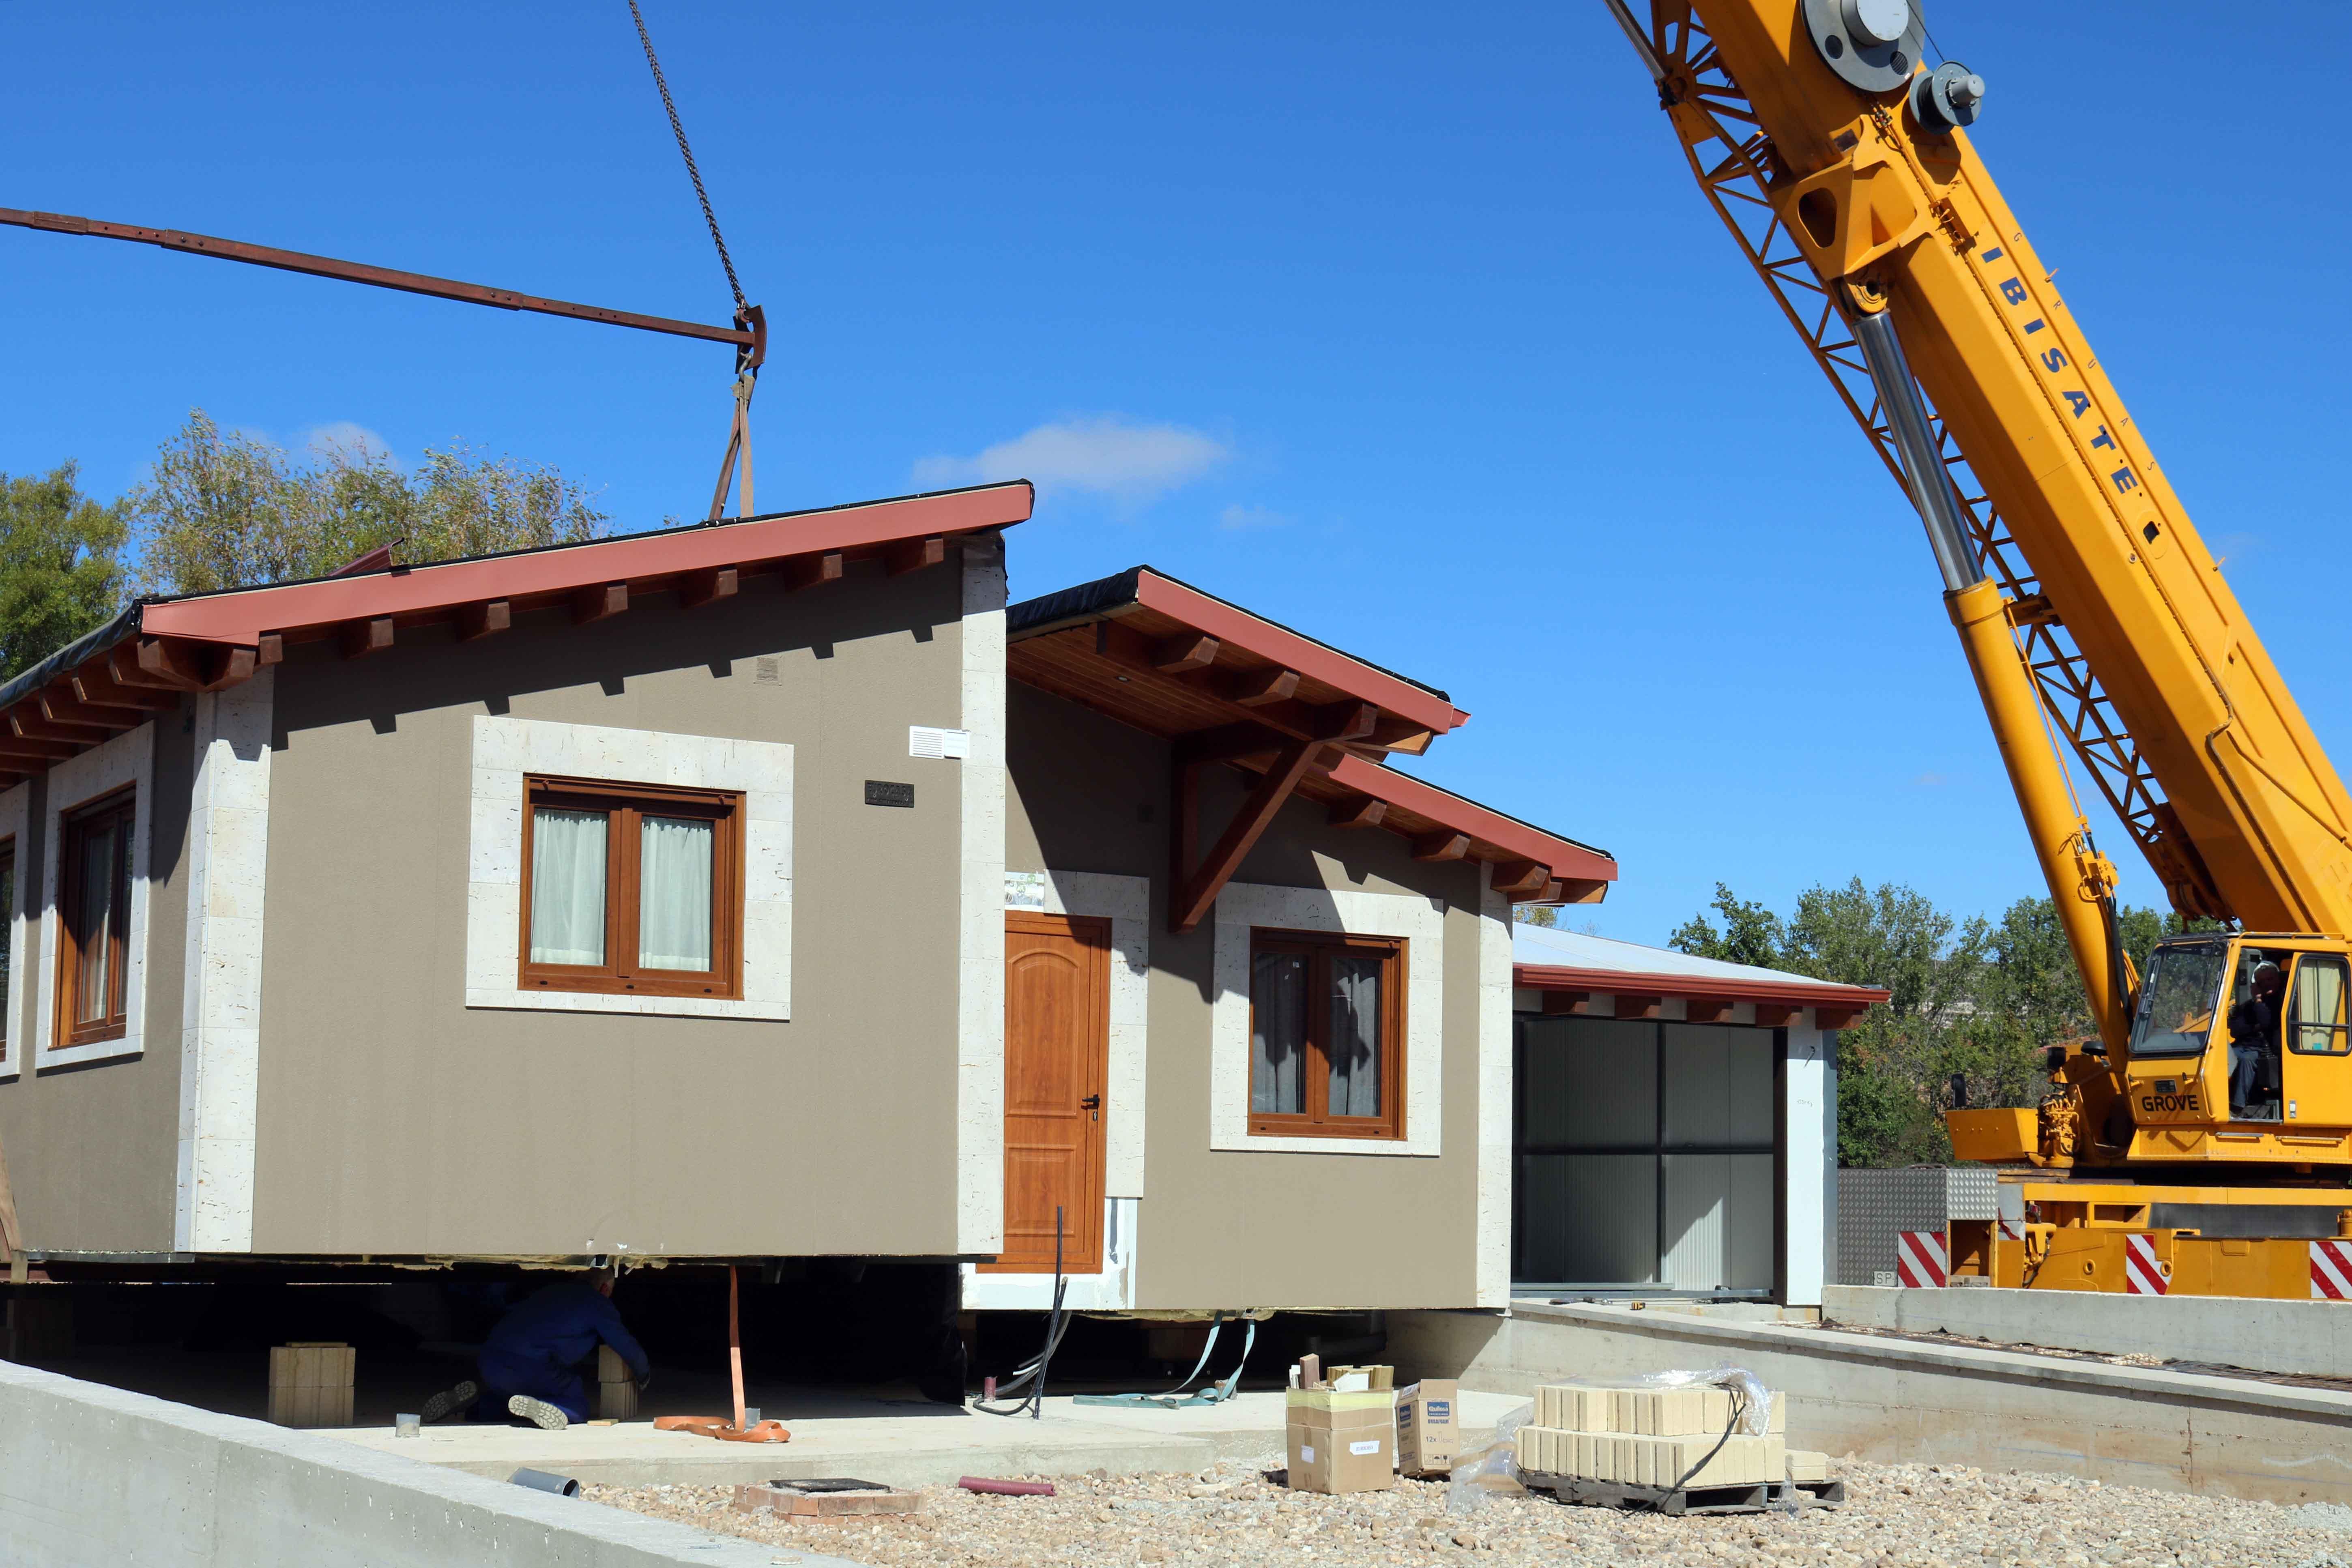 Transporte y montaje casas prefabricadas eurocasa - Casas prefabricadas eurocasa ...